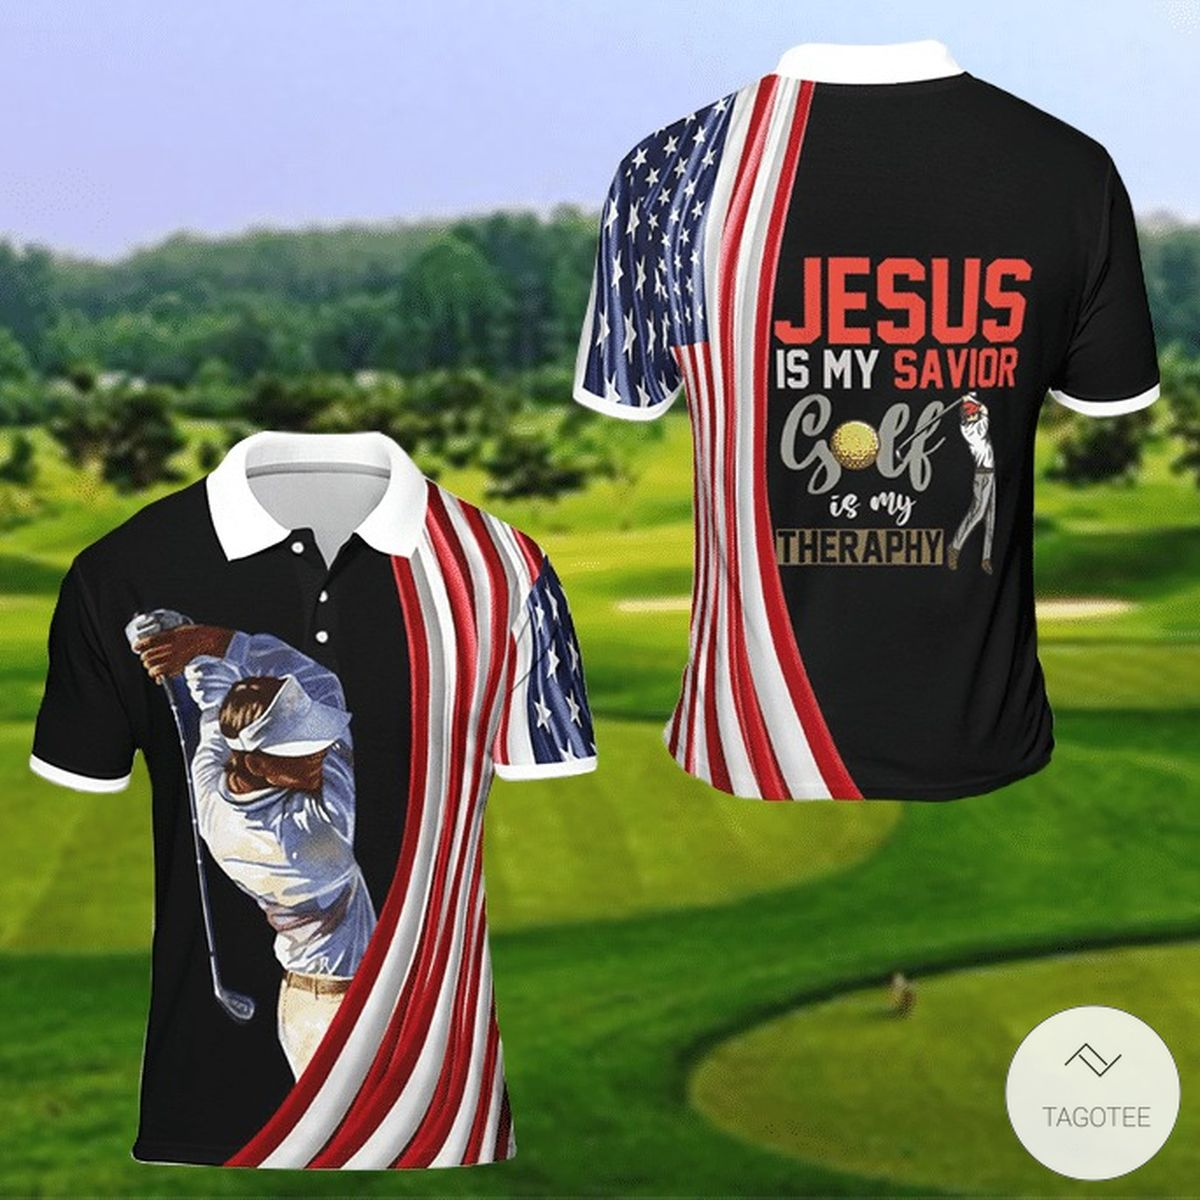 Jesus Is My Savior Golf Is My Therapy Polo Shirt